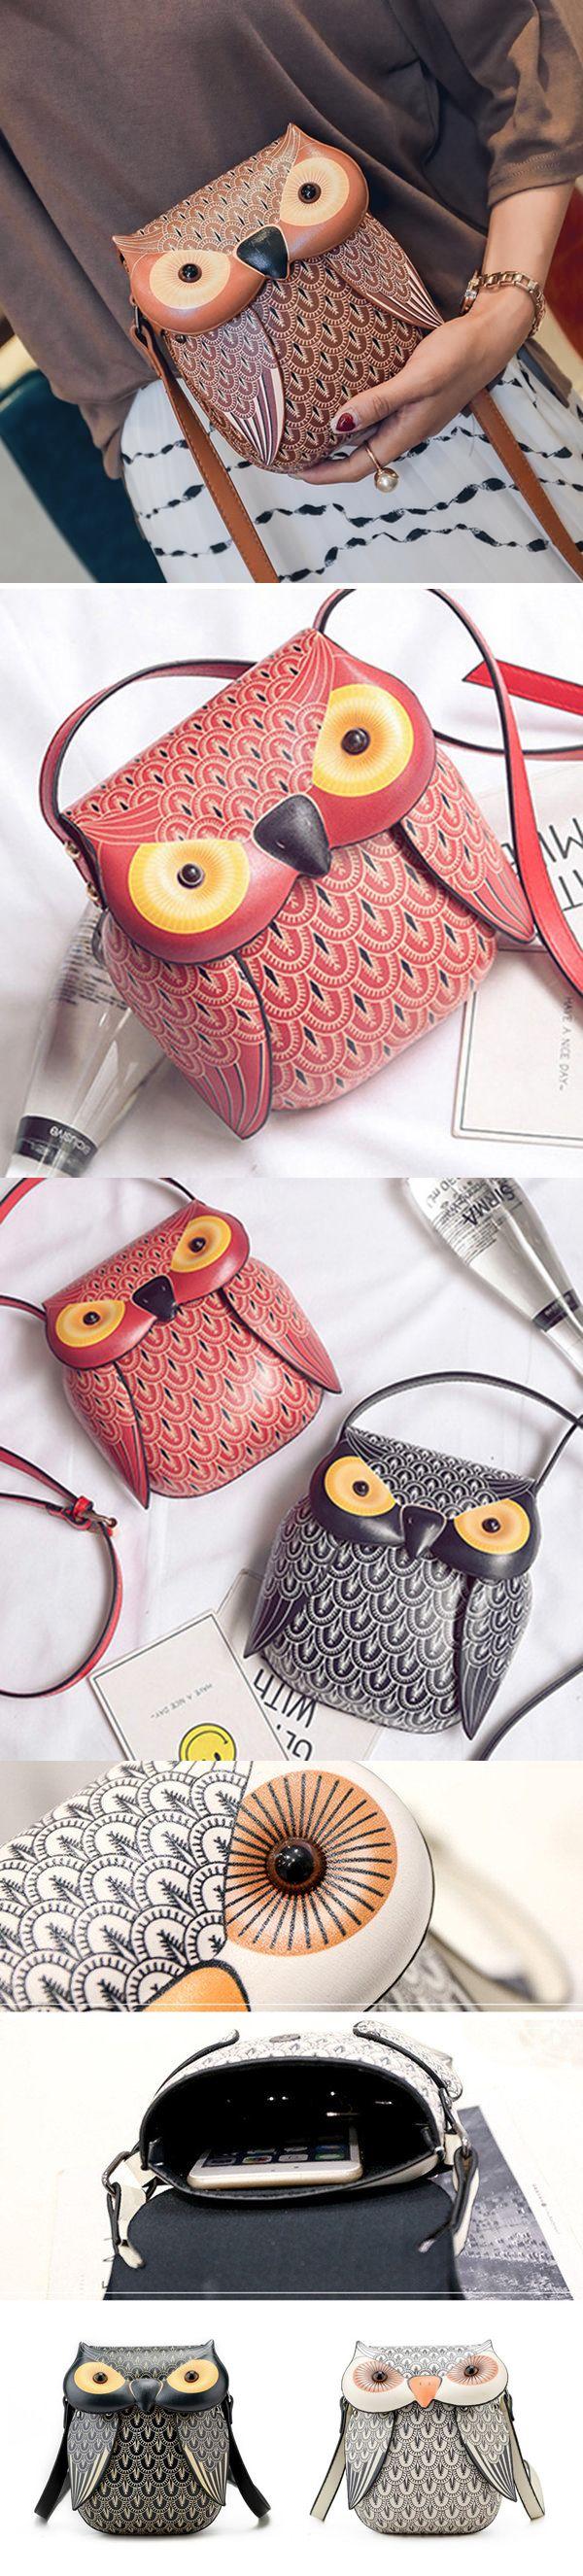 [$ 17.85]   Cartoon Owl Shape Shoulder Bag Creative Crossbody Bag Phone Bag